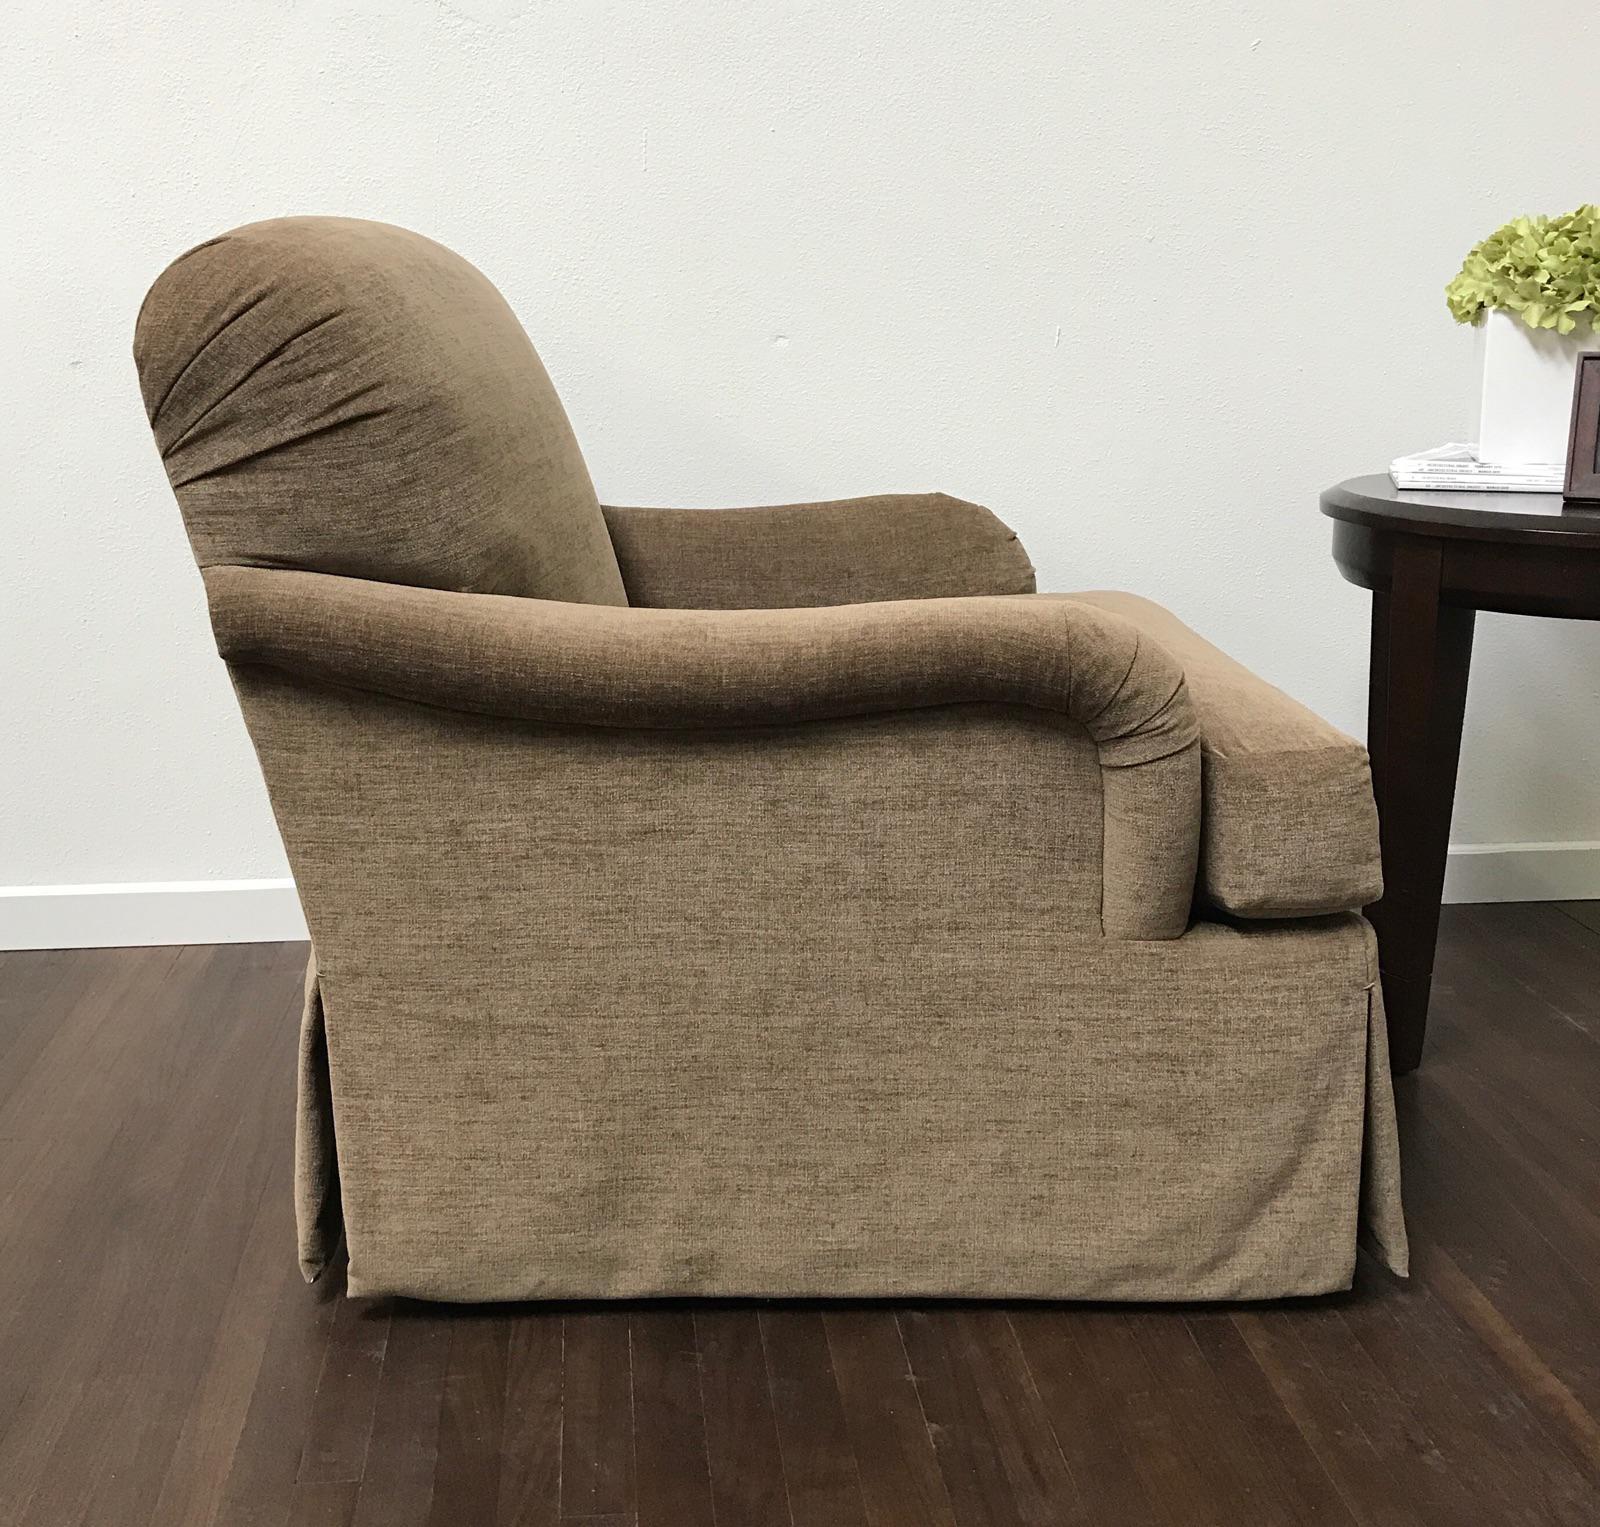 RJones RJones Martin Skirted Swivel Lounge Chair For Sale   Image 4 Of 8